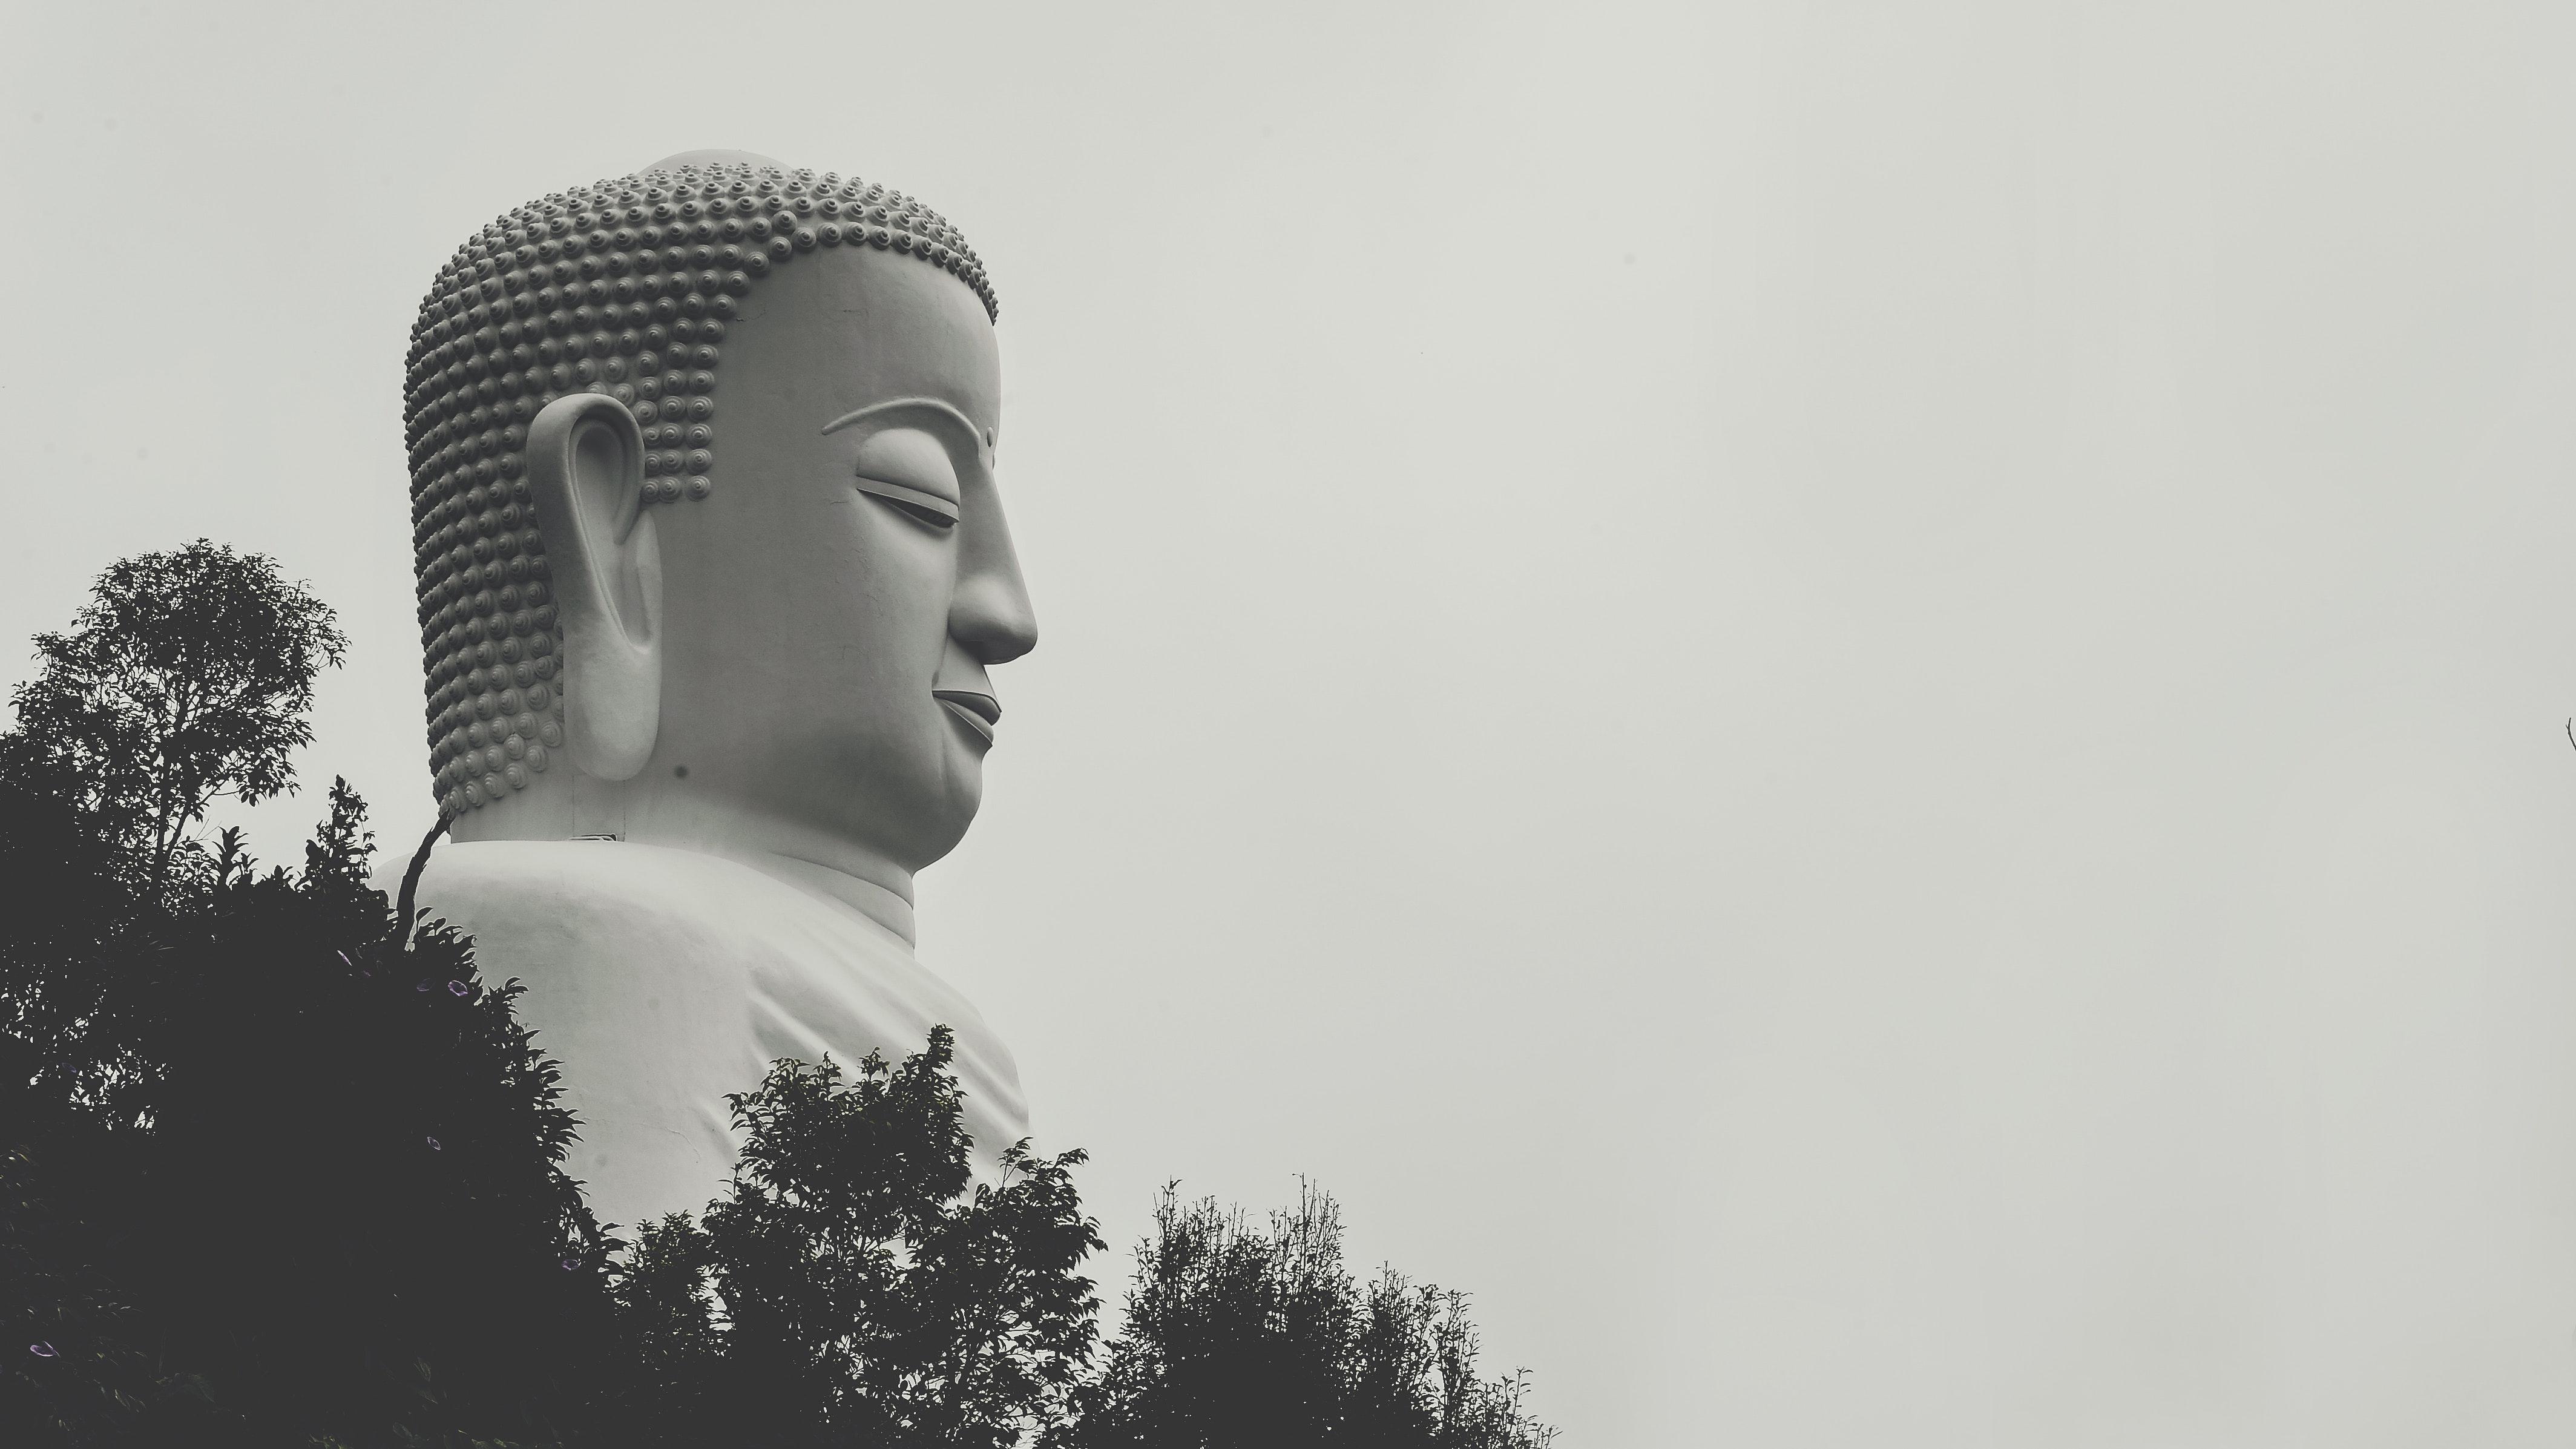 Side view photo of gautama buddha statue